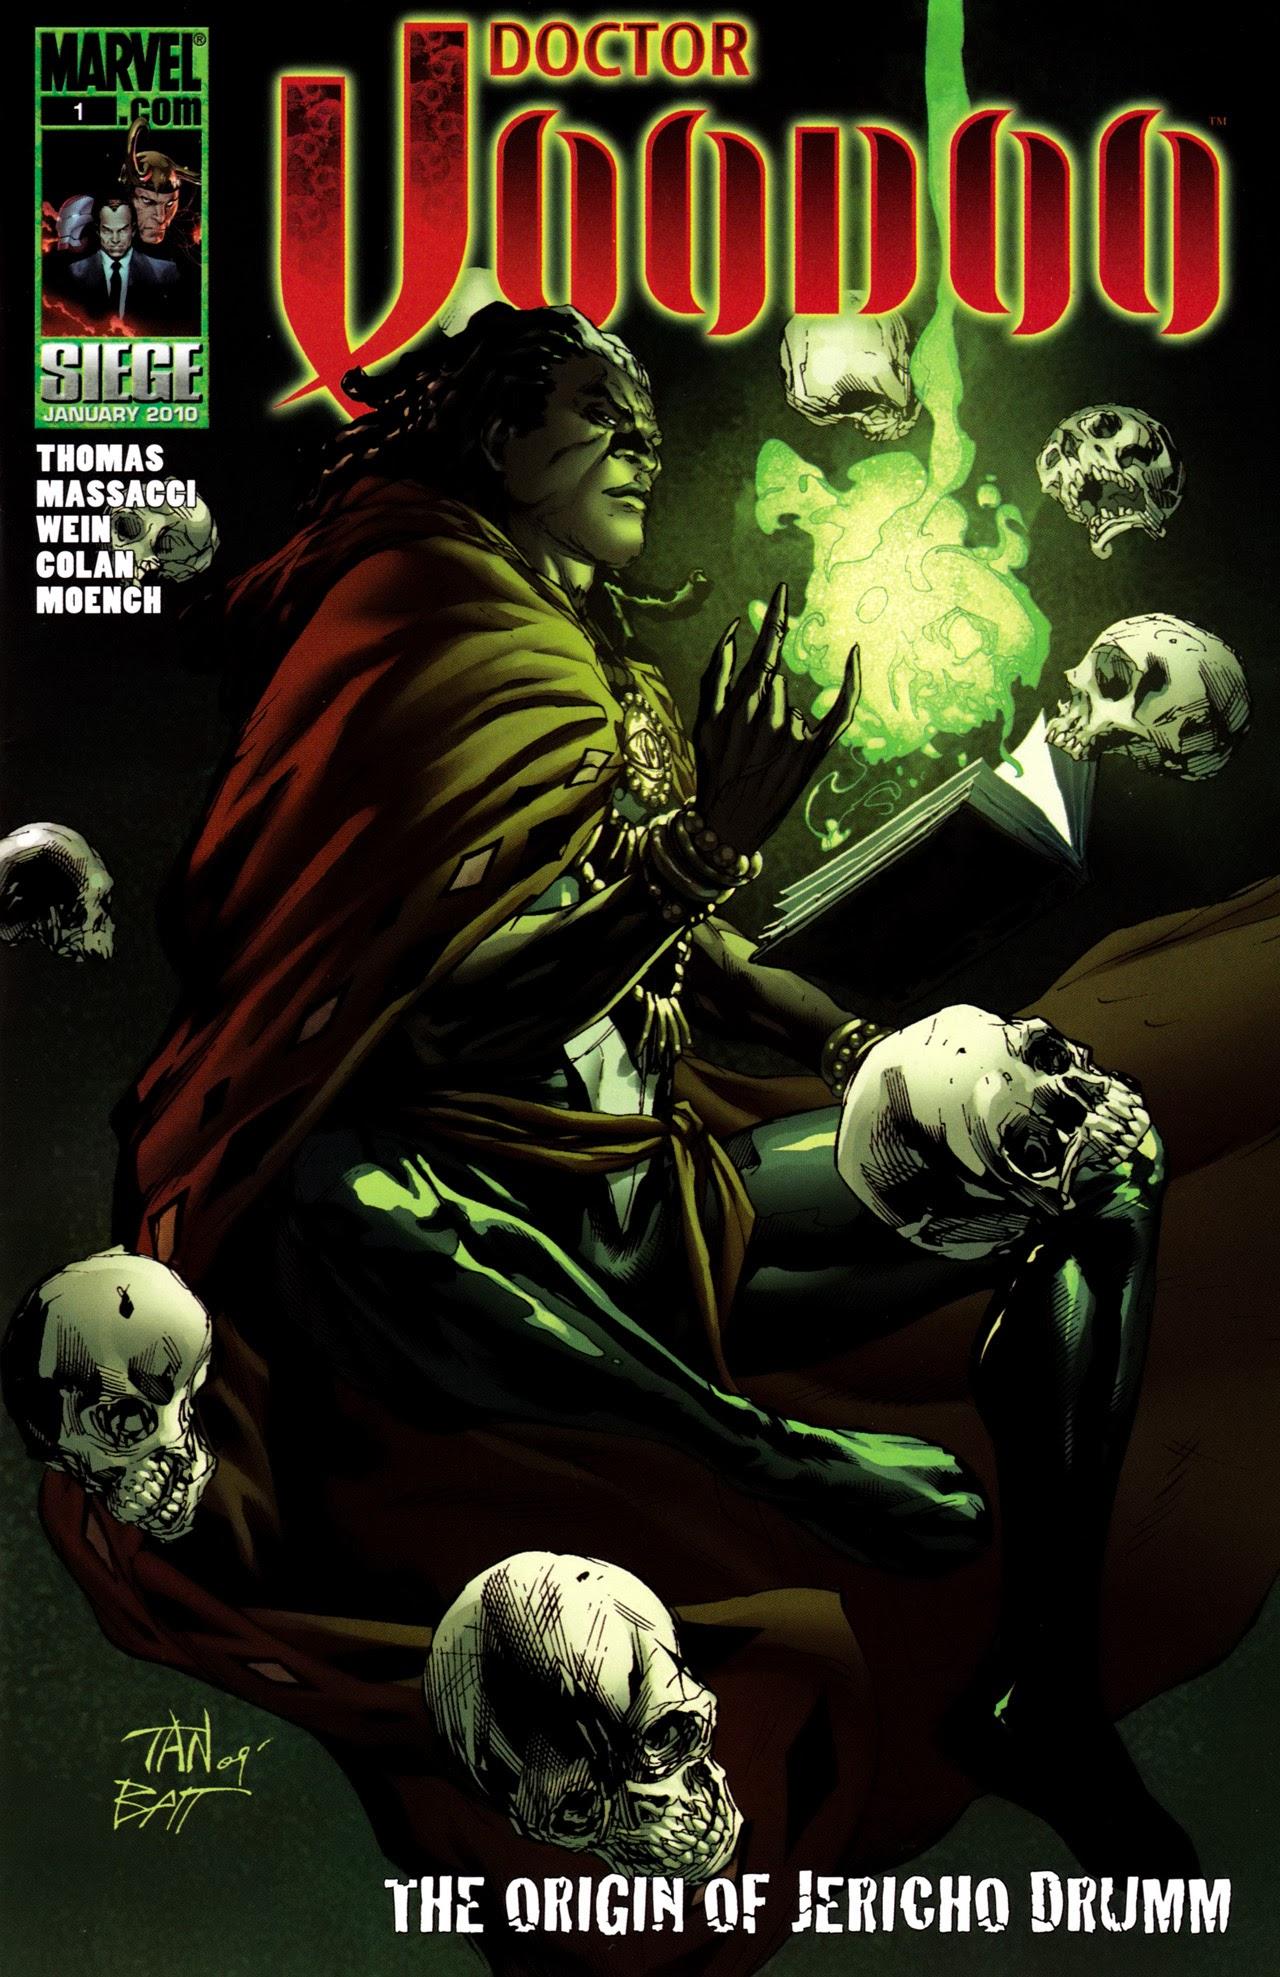 Doctor Voodoo: The Origin of Jericho Drumm Full Page 1